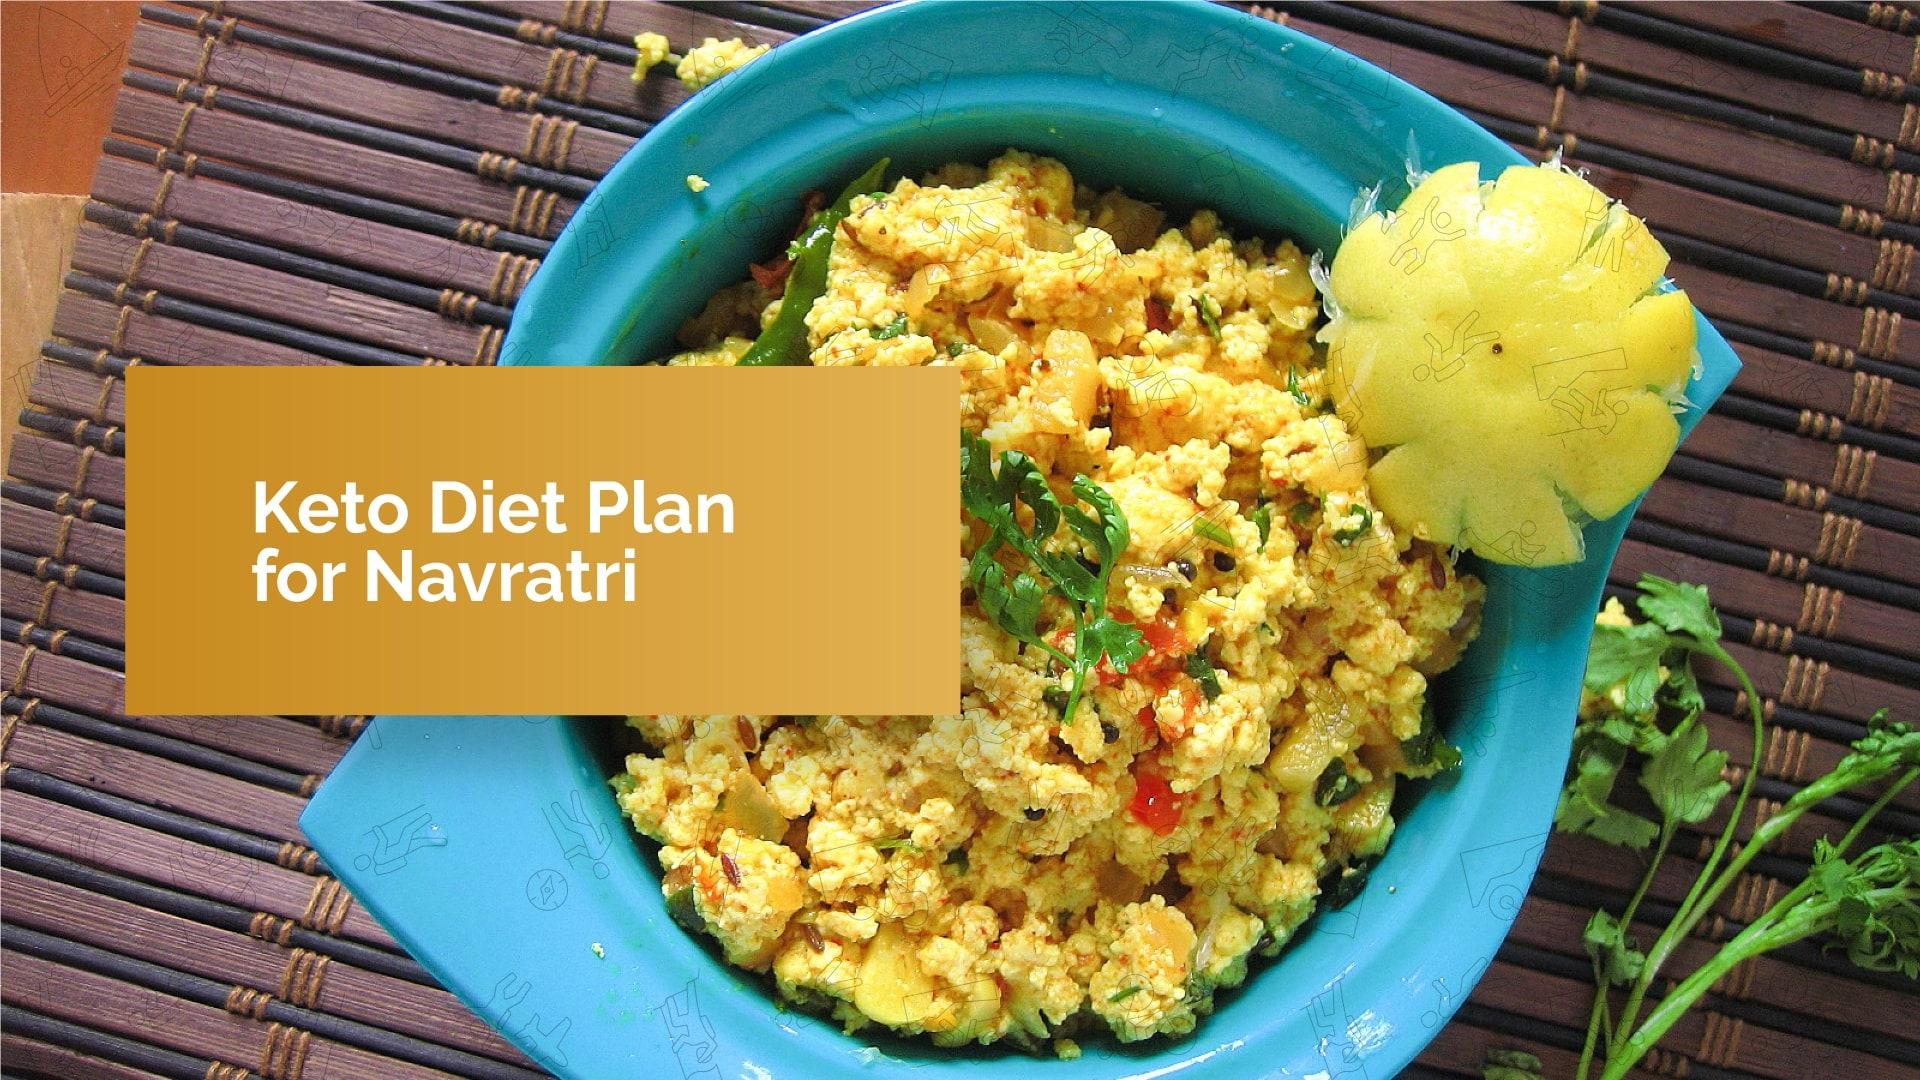 Keto Diet Plan for Navratri